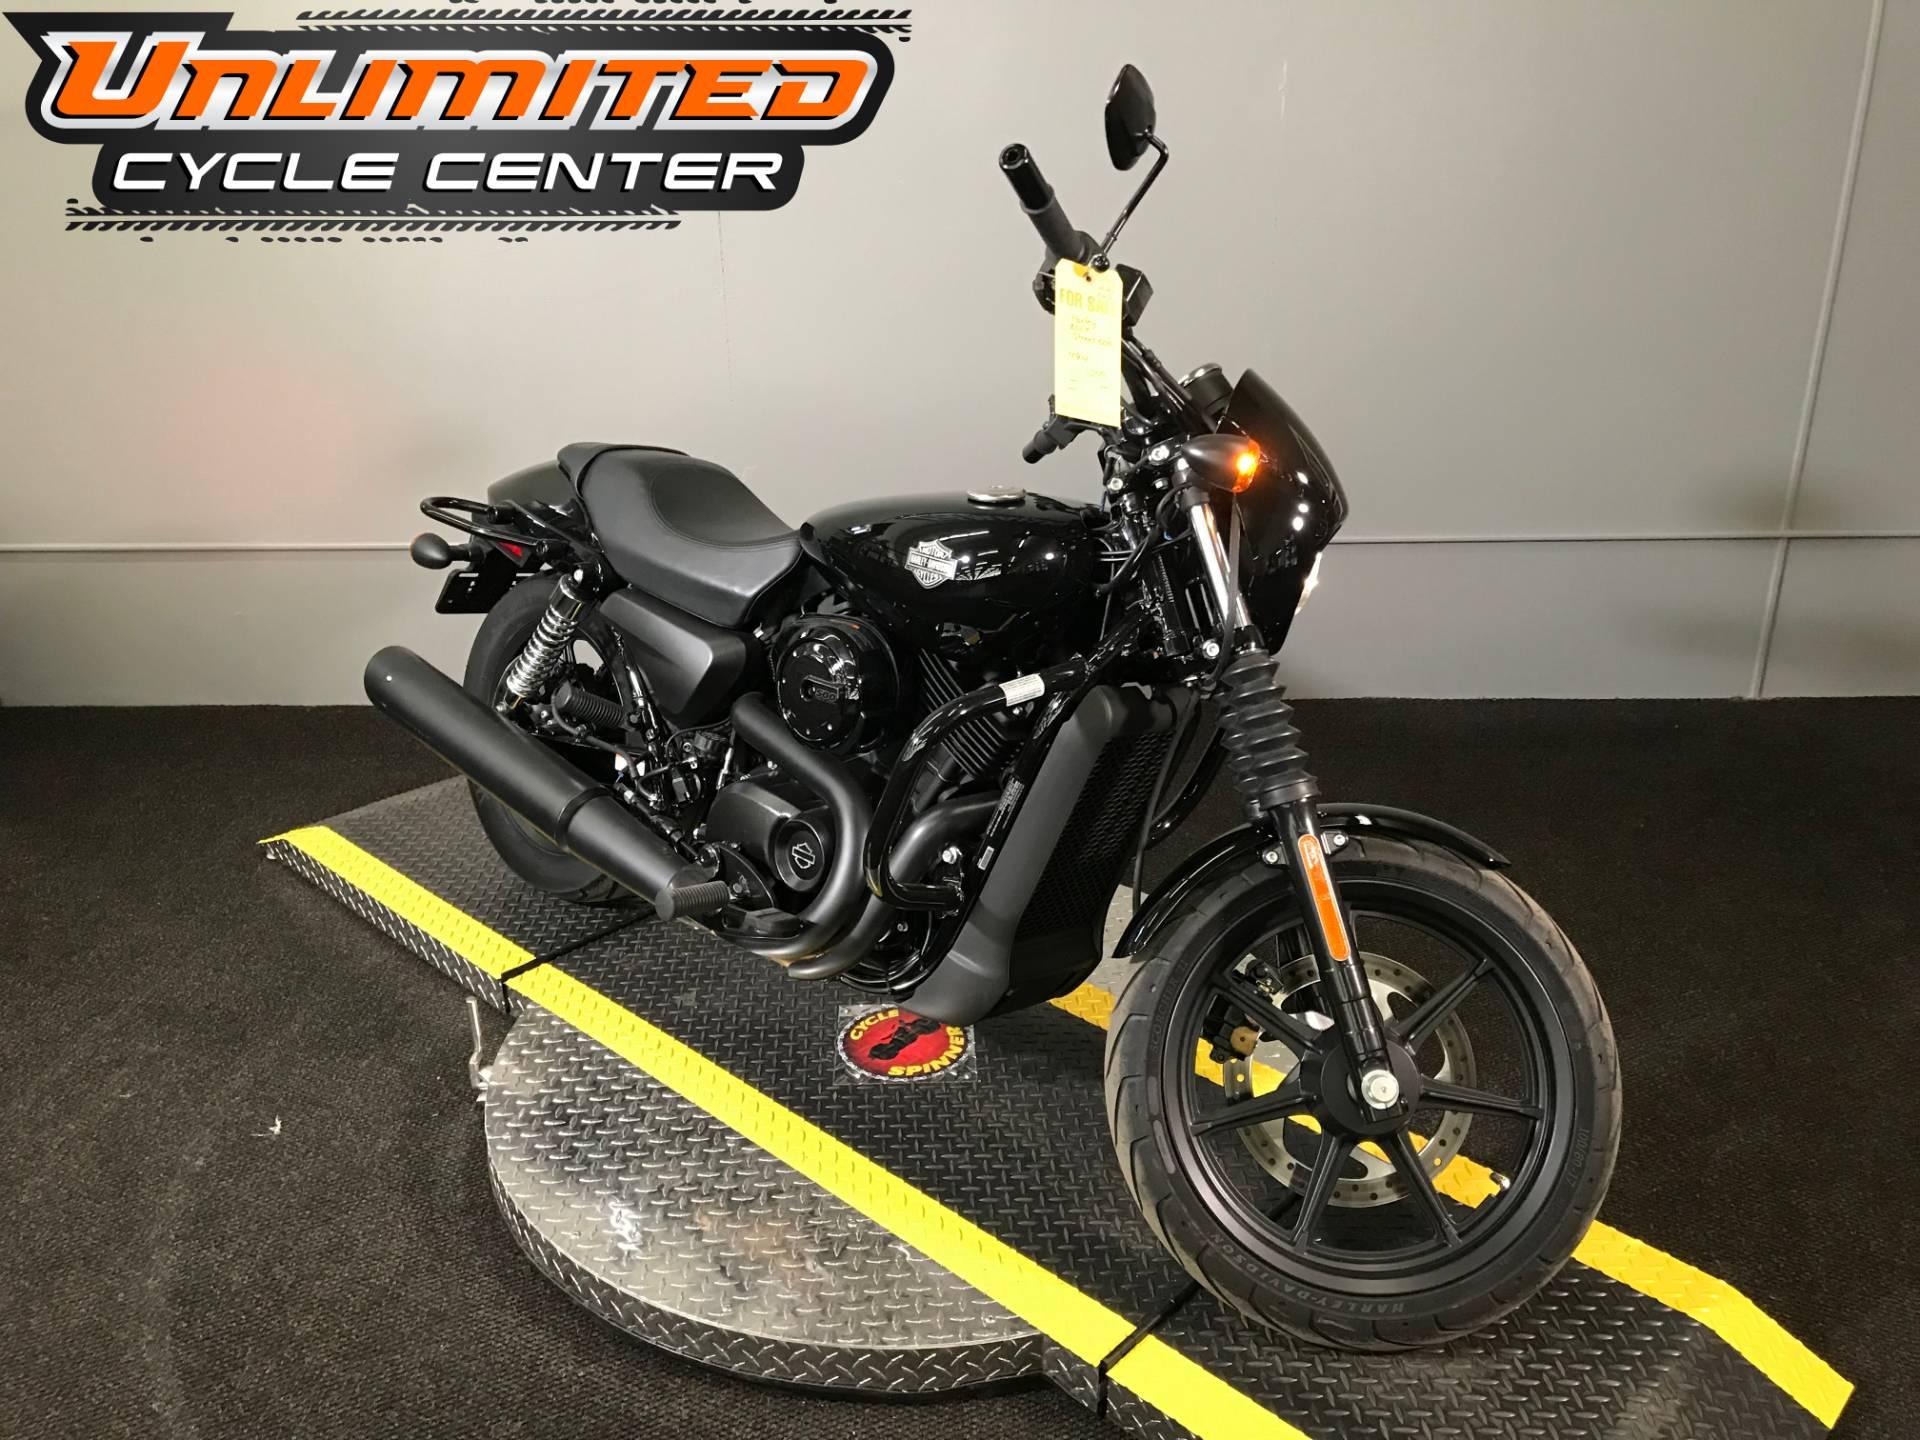 2017 Harley Davidson Street 500 In Tyrone Pennsylvania Photo 1